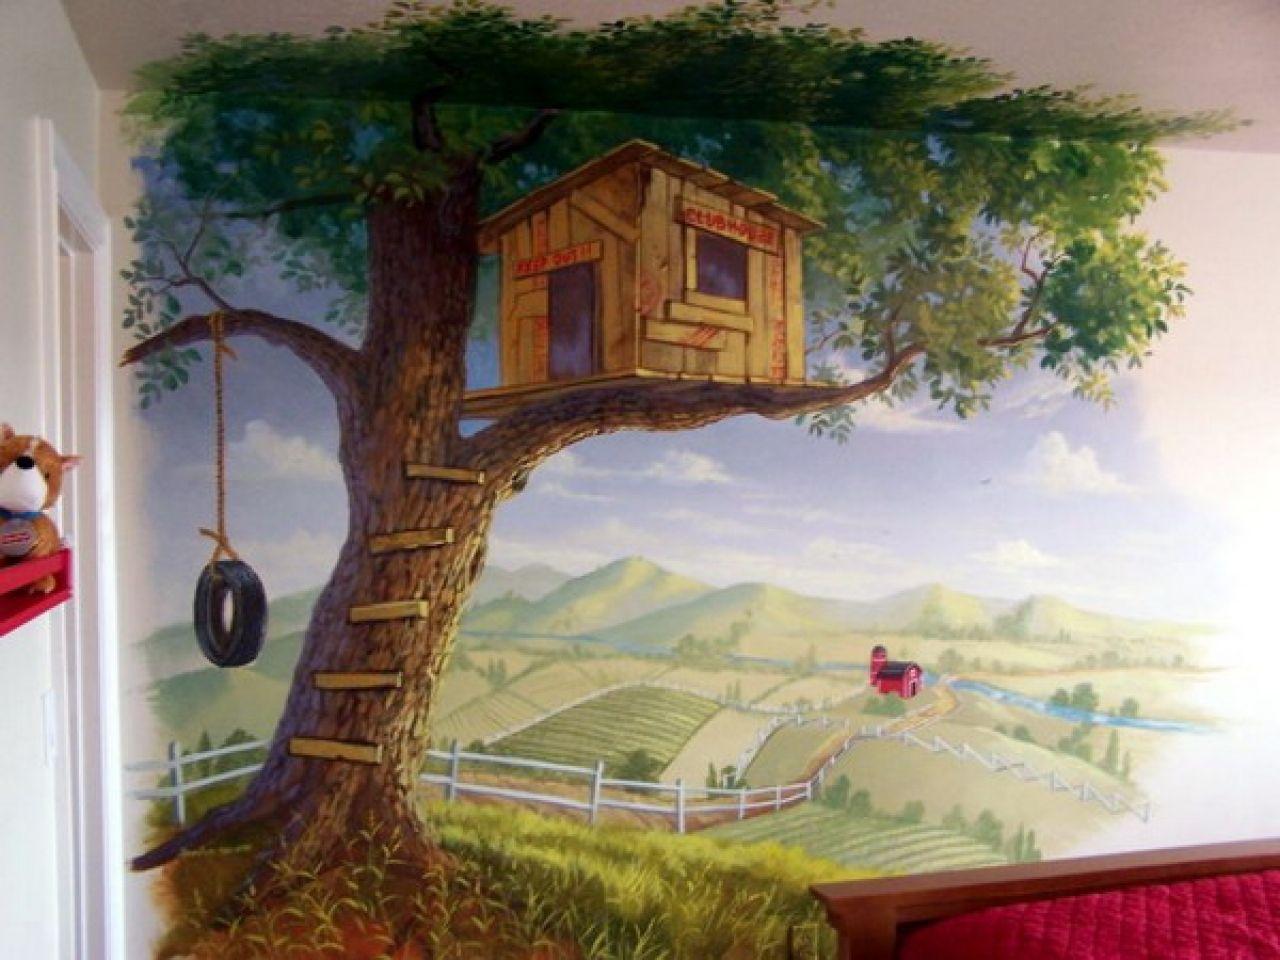 Tree House Wall Murals Decorating Ideas Best Wall Murals Gallery